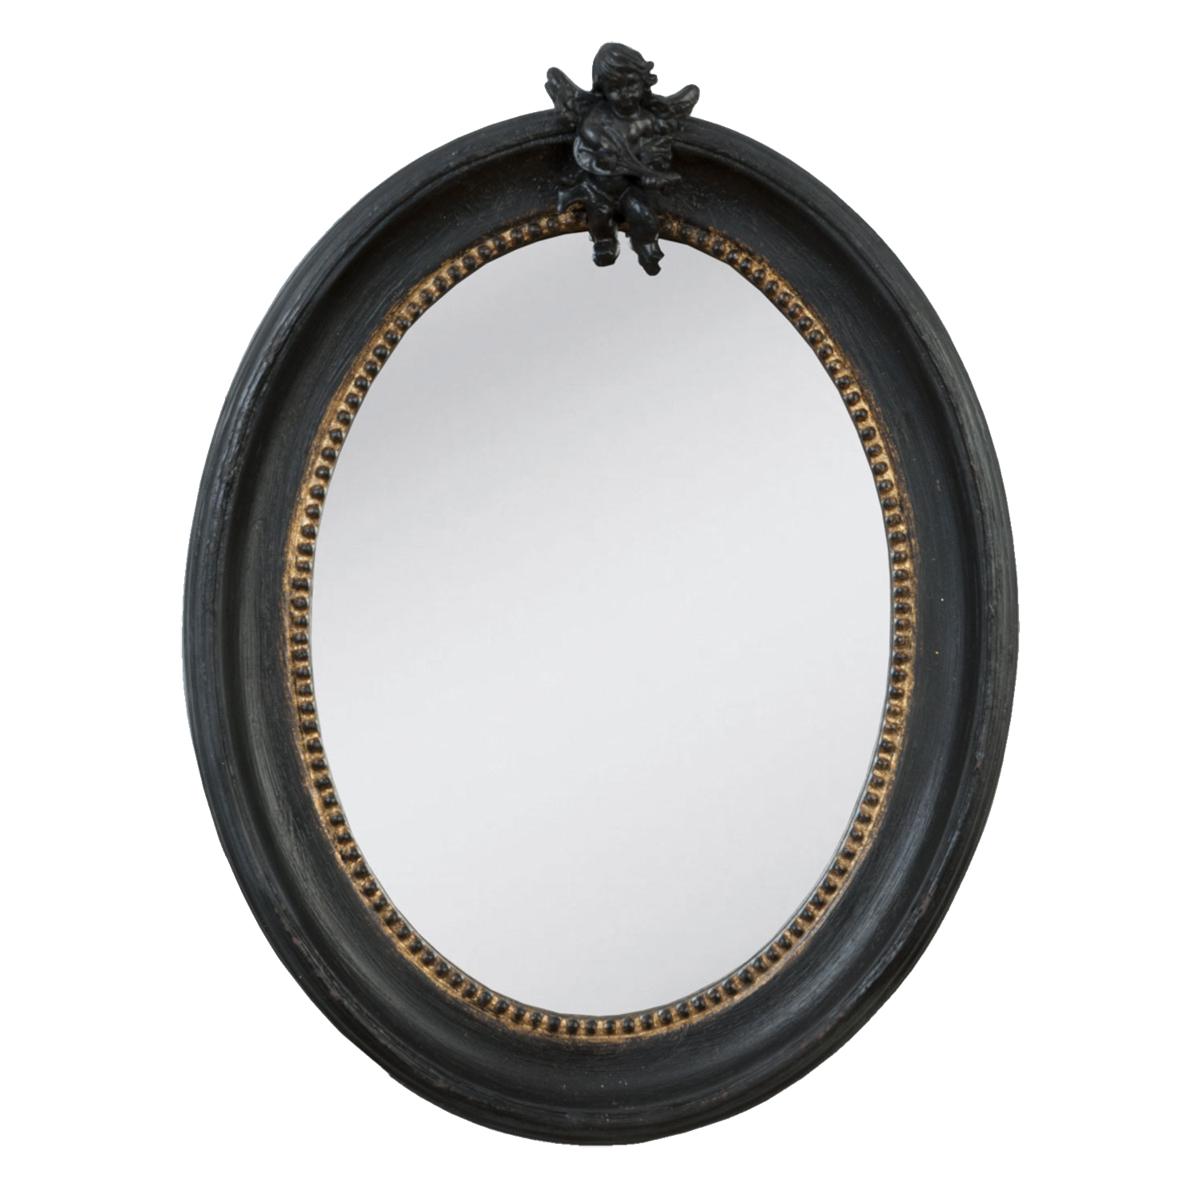 Oglinda Din Lemn Negru 30x40 Cm